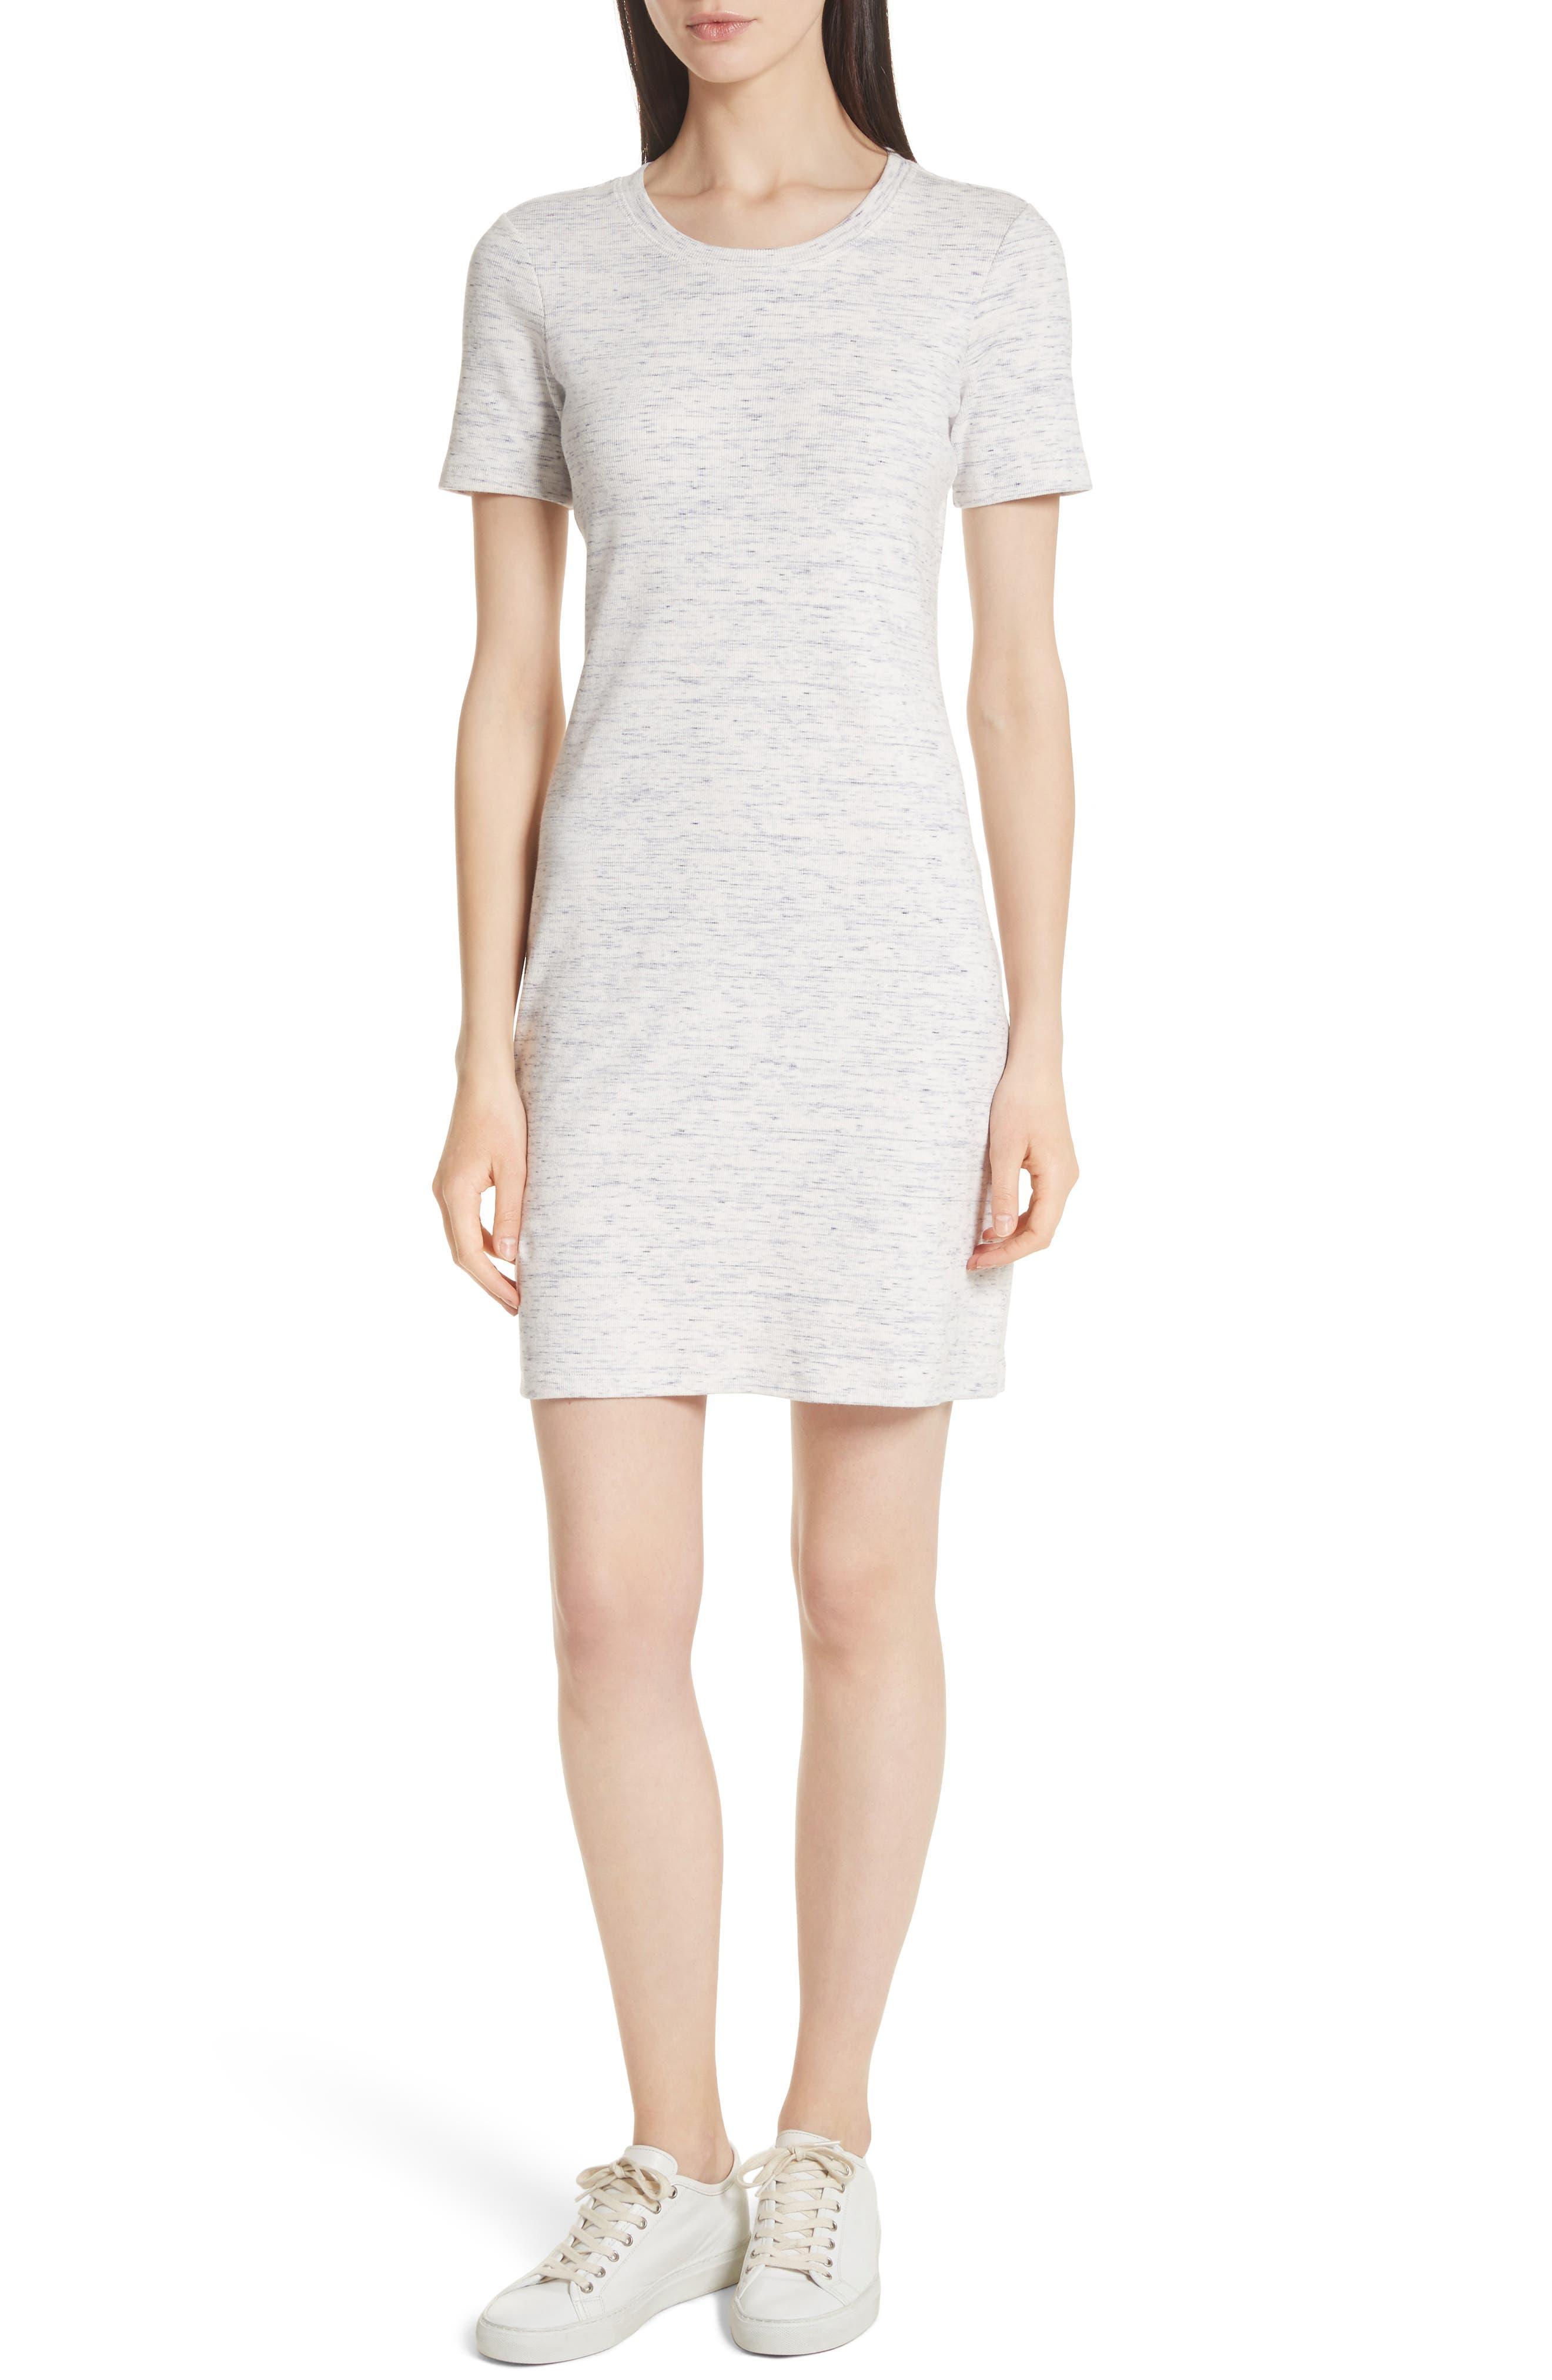 Cherry B3. T-Shirt Dress,                             Main thumbnail 1, color,                             483